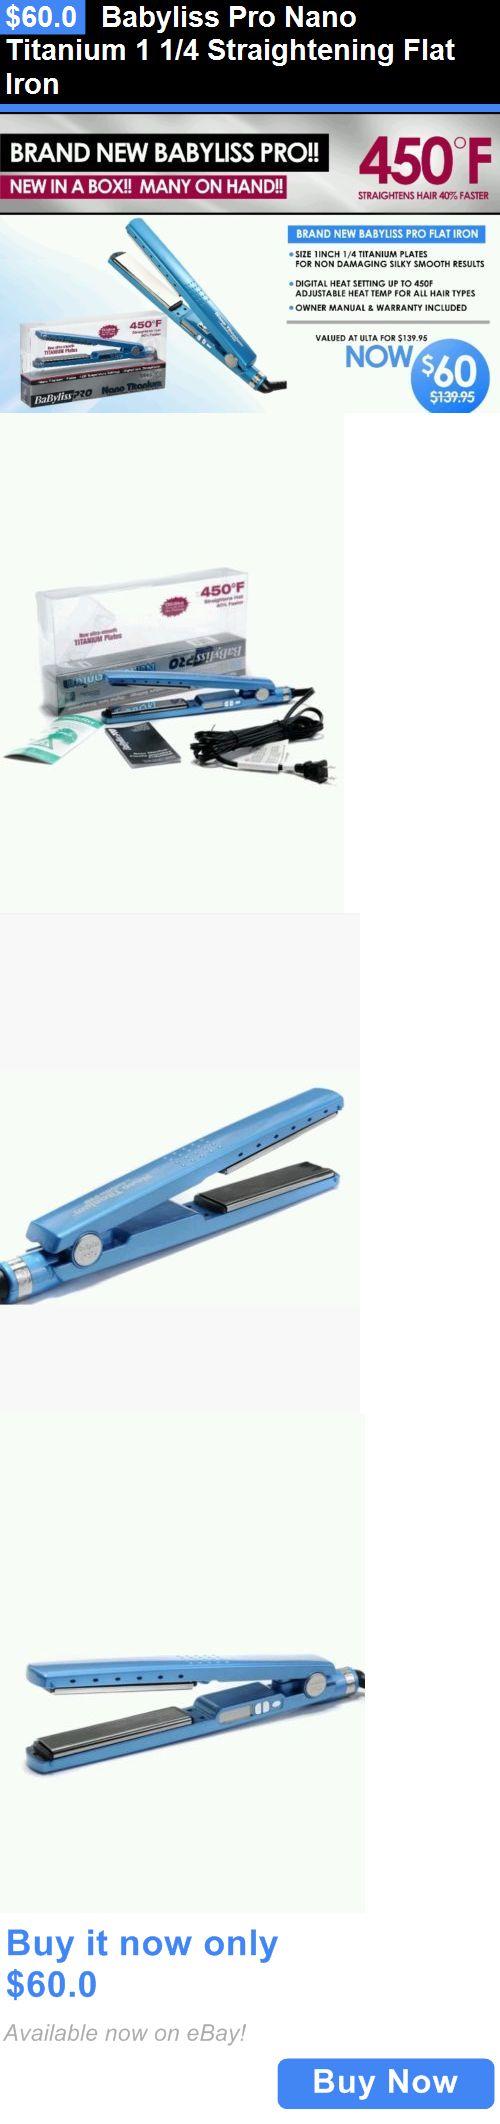 Hair Beauty: Babyliss Pro Nano Titanium 1 1/4 Straightening Flat Iron BUY IT NOW ONLY: $60.0